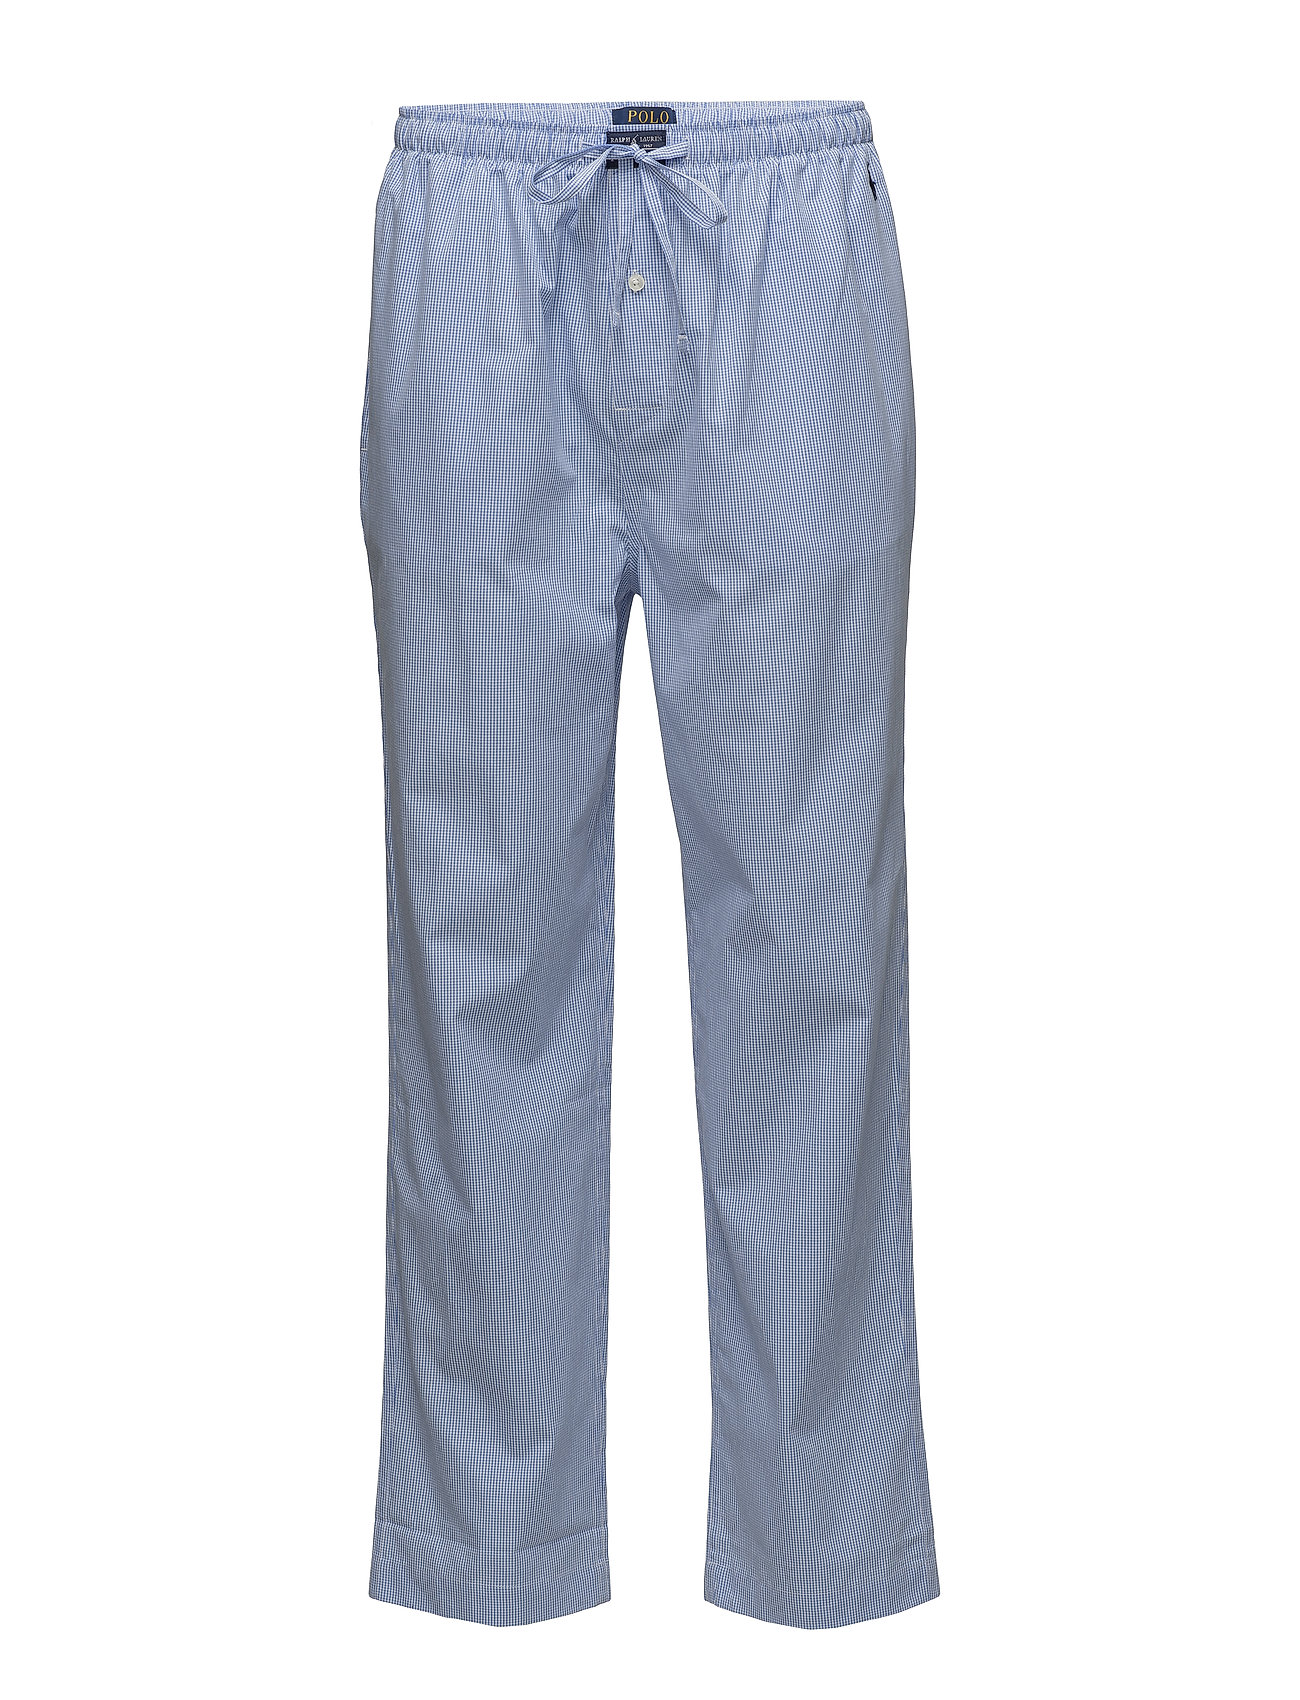 Polo Ralph Lauren Underwear PYJAMA LONG PANT - LT BLUE MINI GI